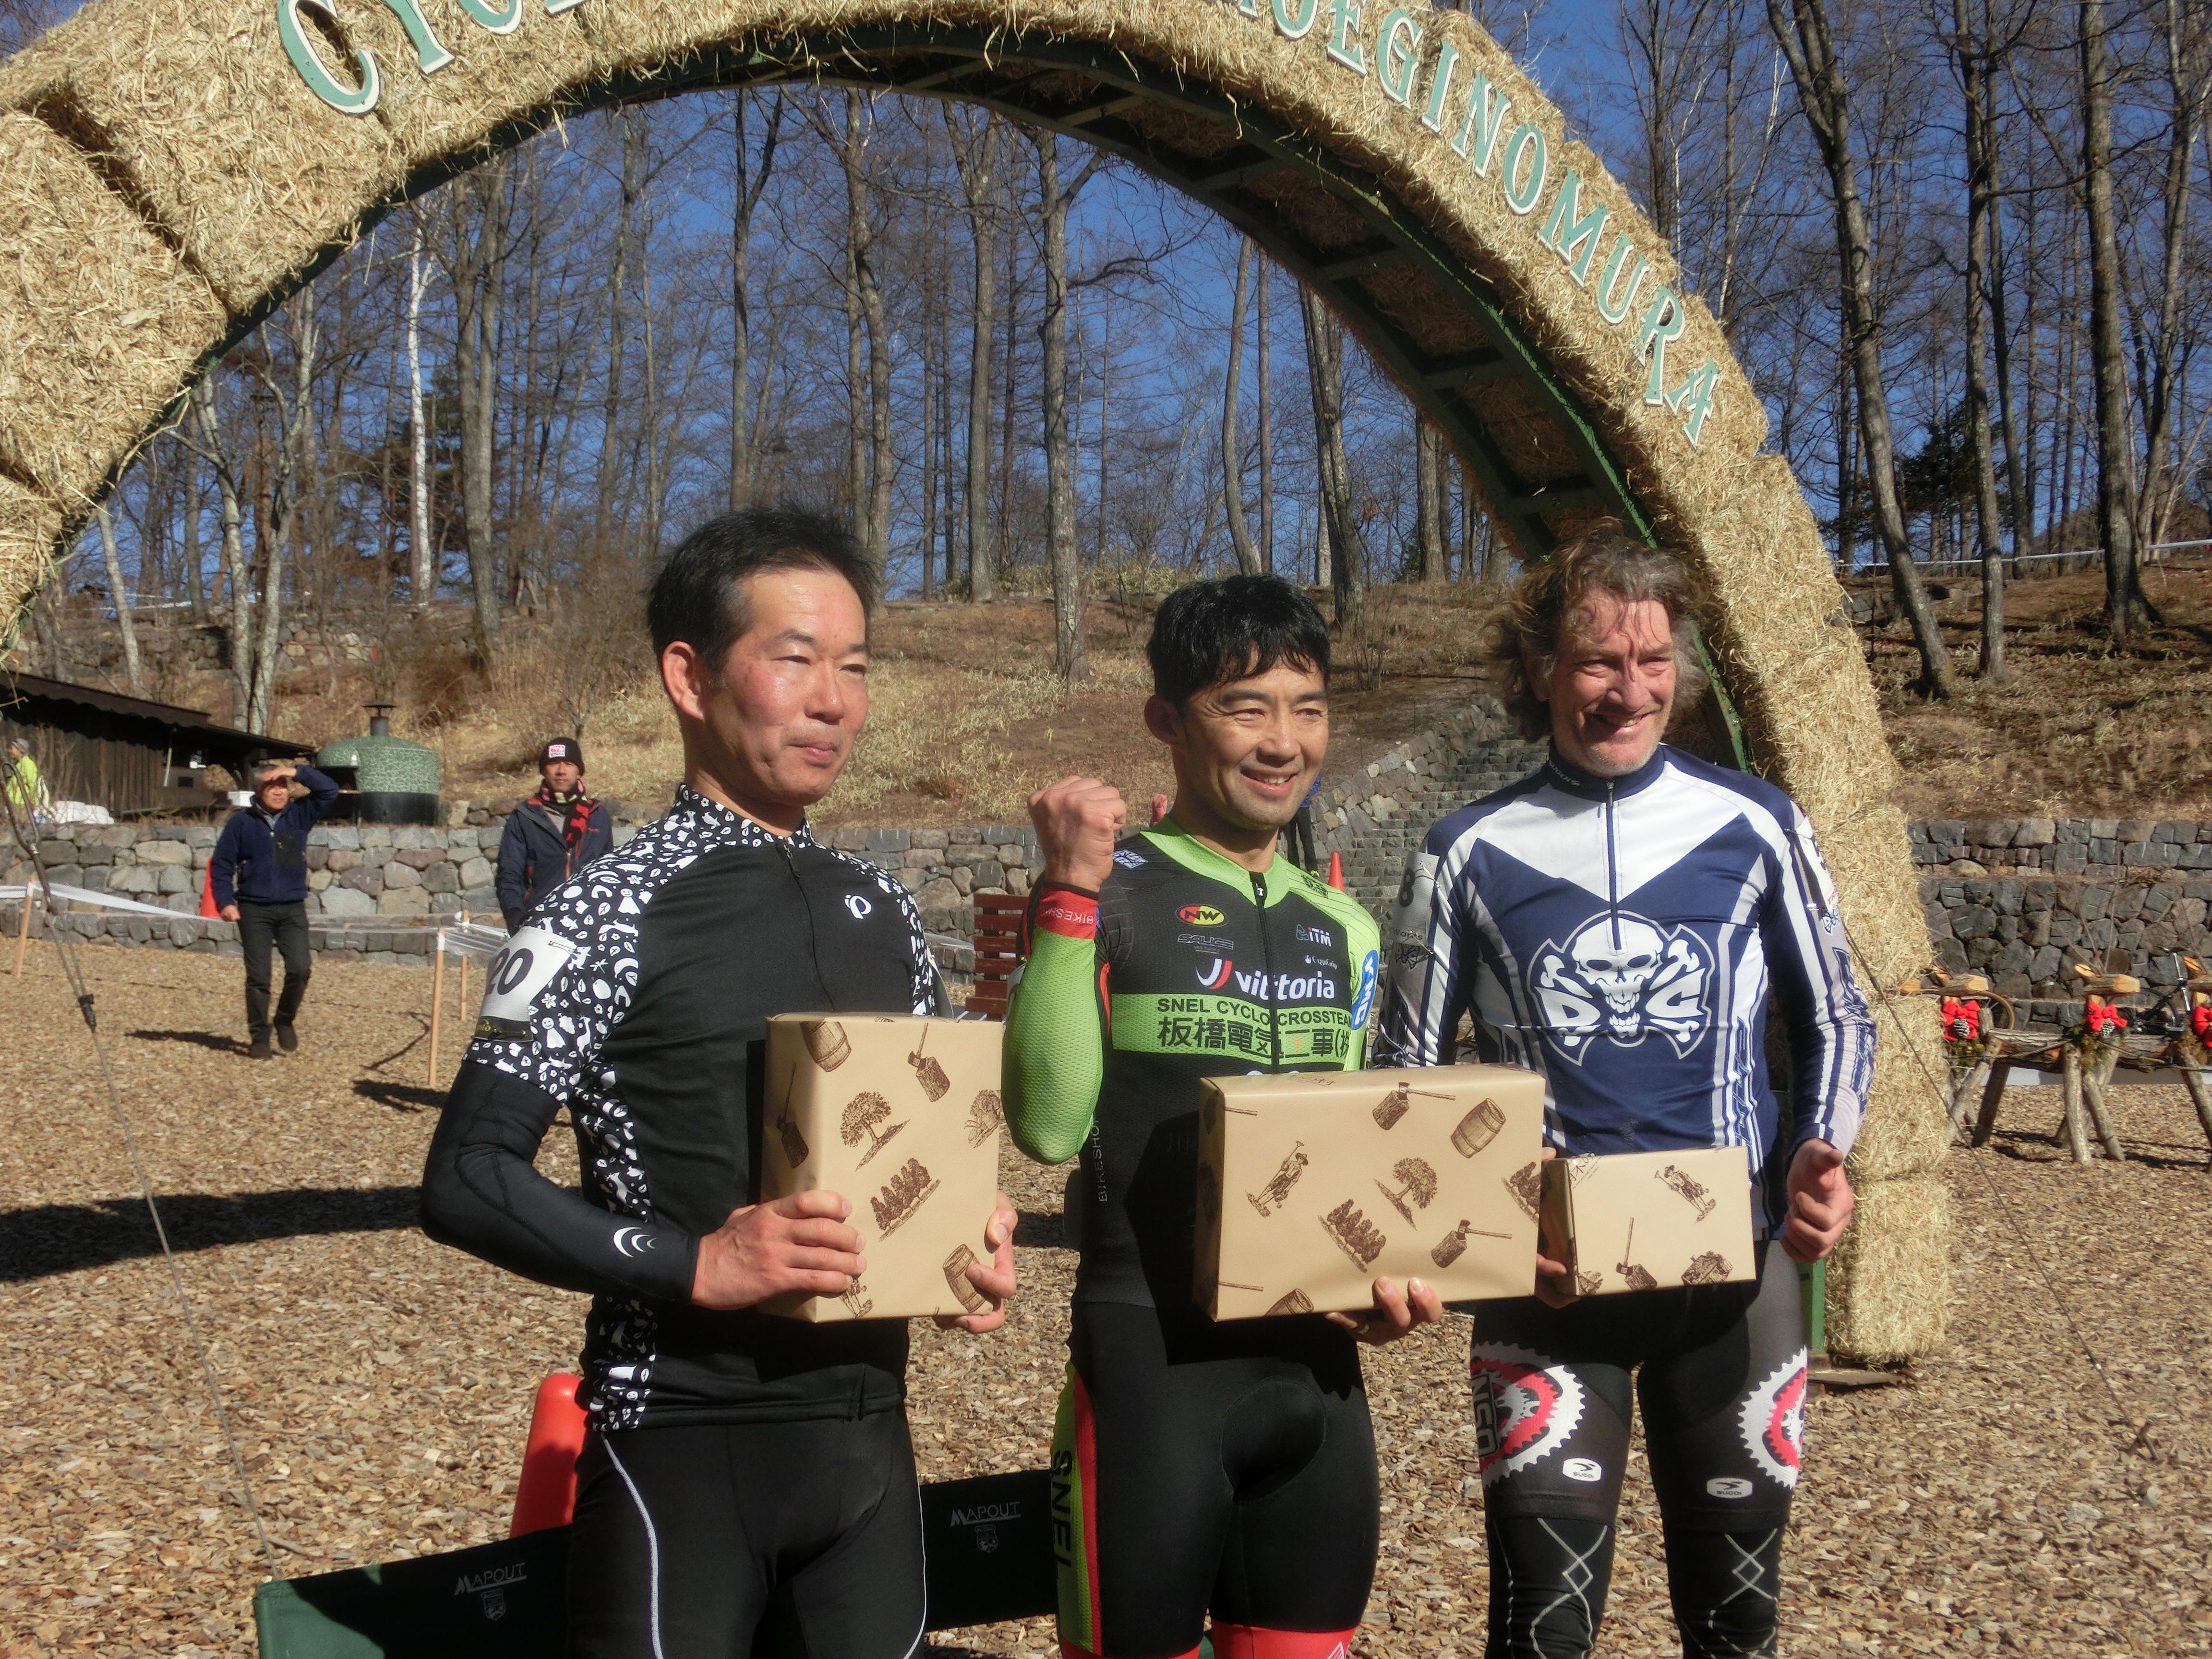 https://www.cyclocross.jp/news/2019_0114CCM189kiyosatomoegi0075.JPG